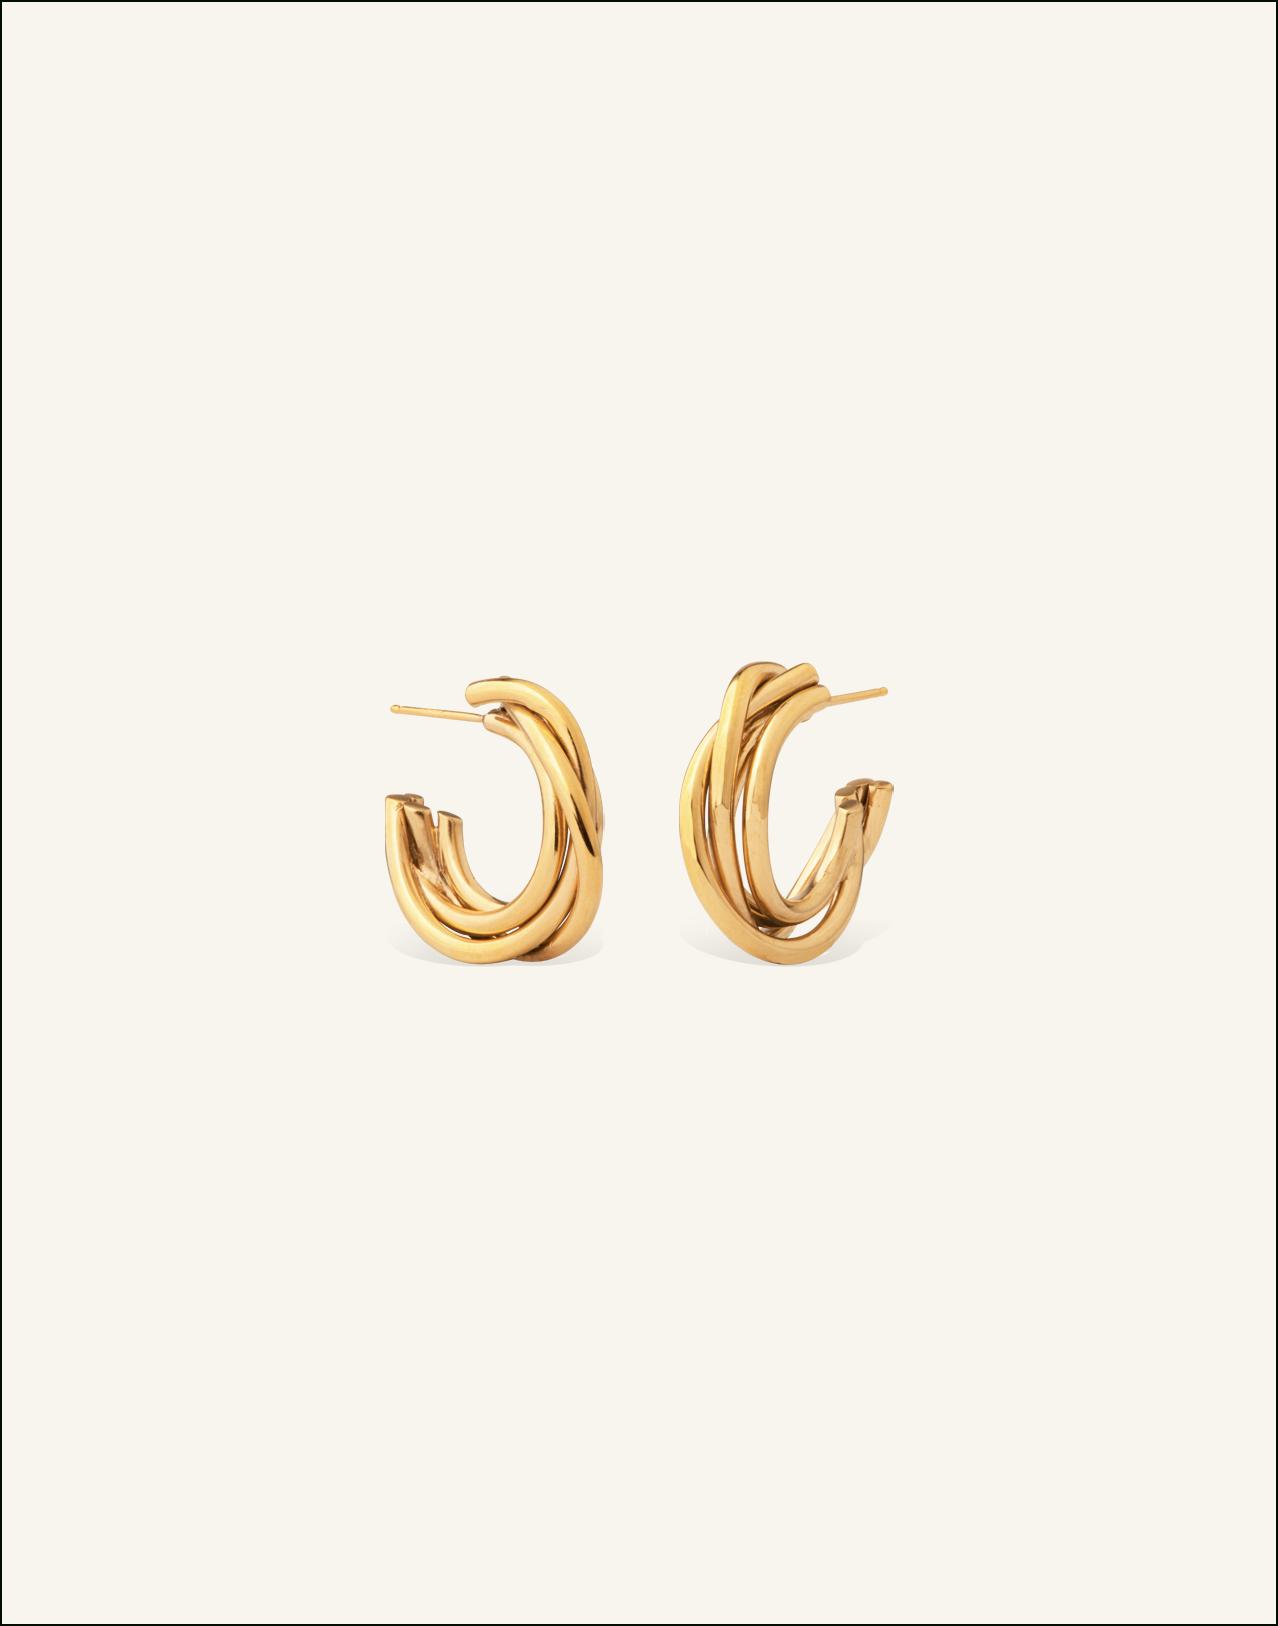 Completedworks-Earrings-An-Encounter-1-1.jpg